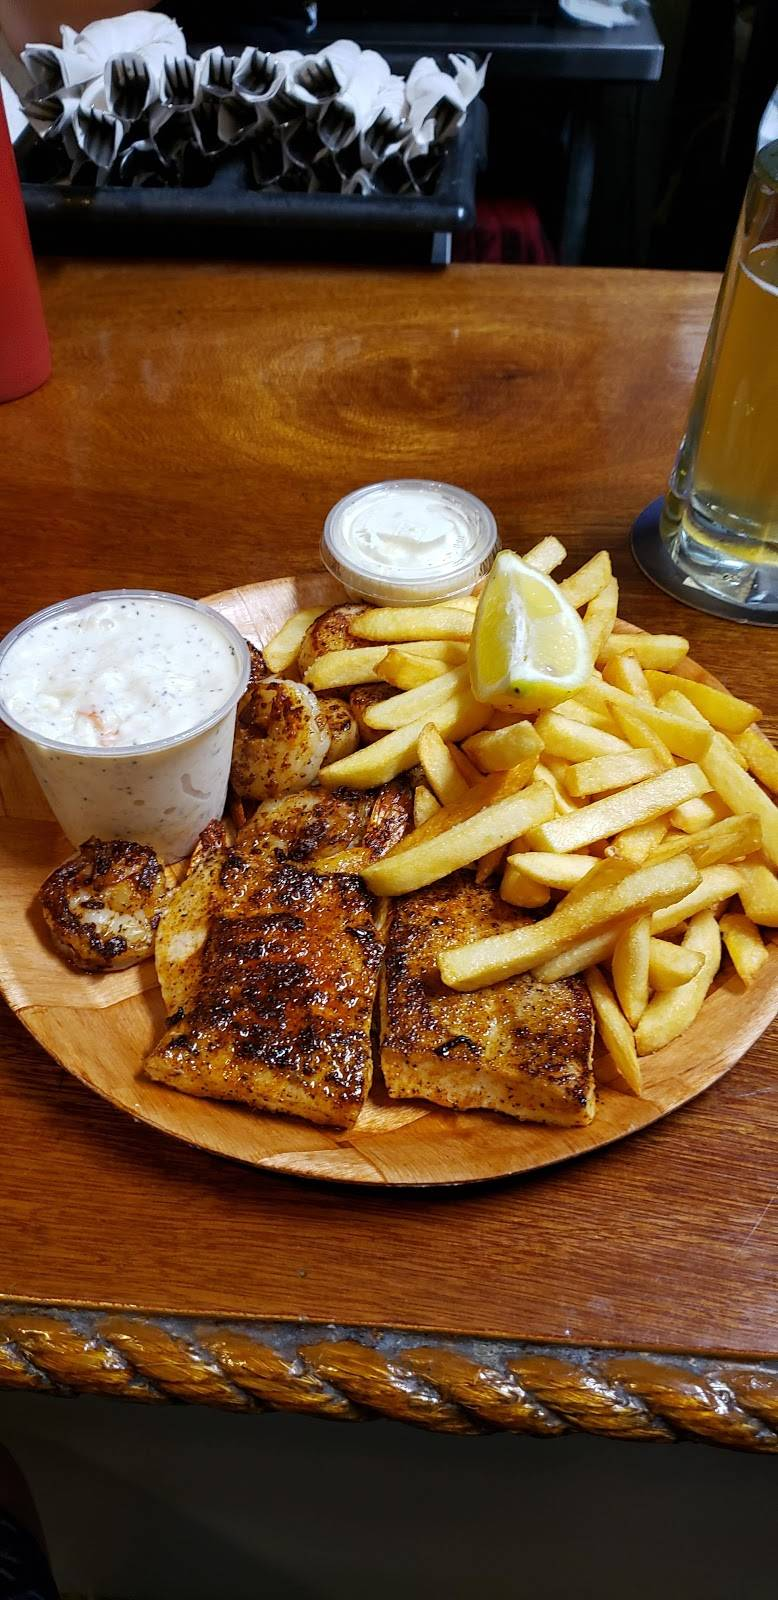 Fish Shack | restaurant | 2460 N Federal Hwy, Lighthouse Point, FL 33064, USA | 9545864105 OR +1 954-586-4105